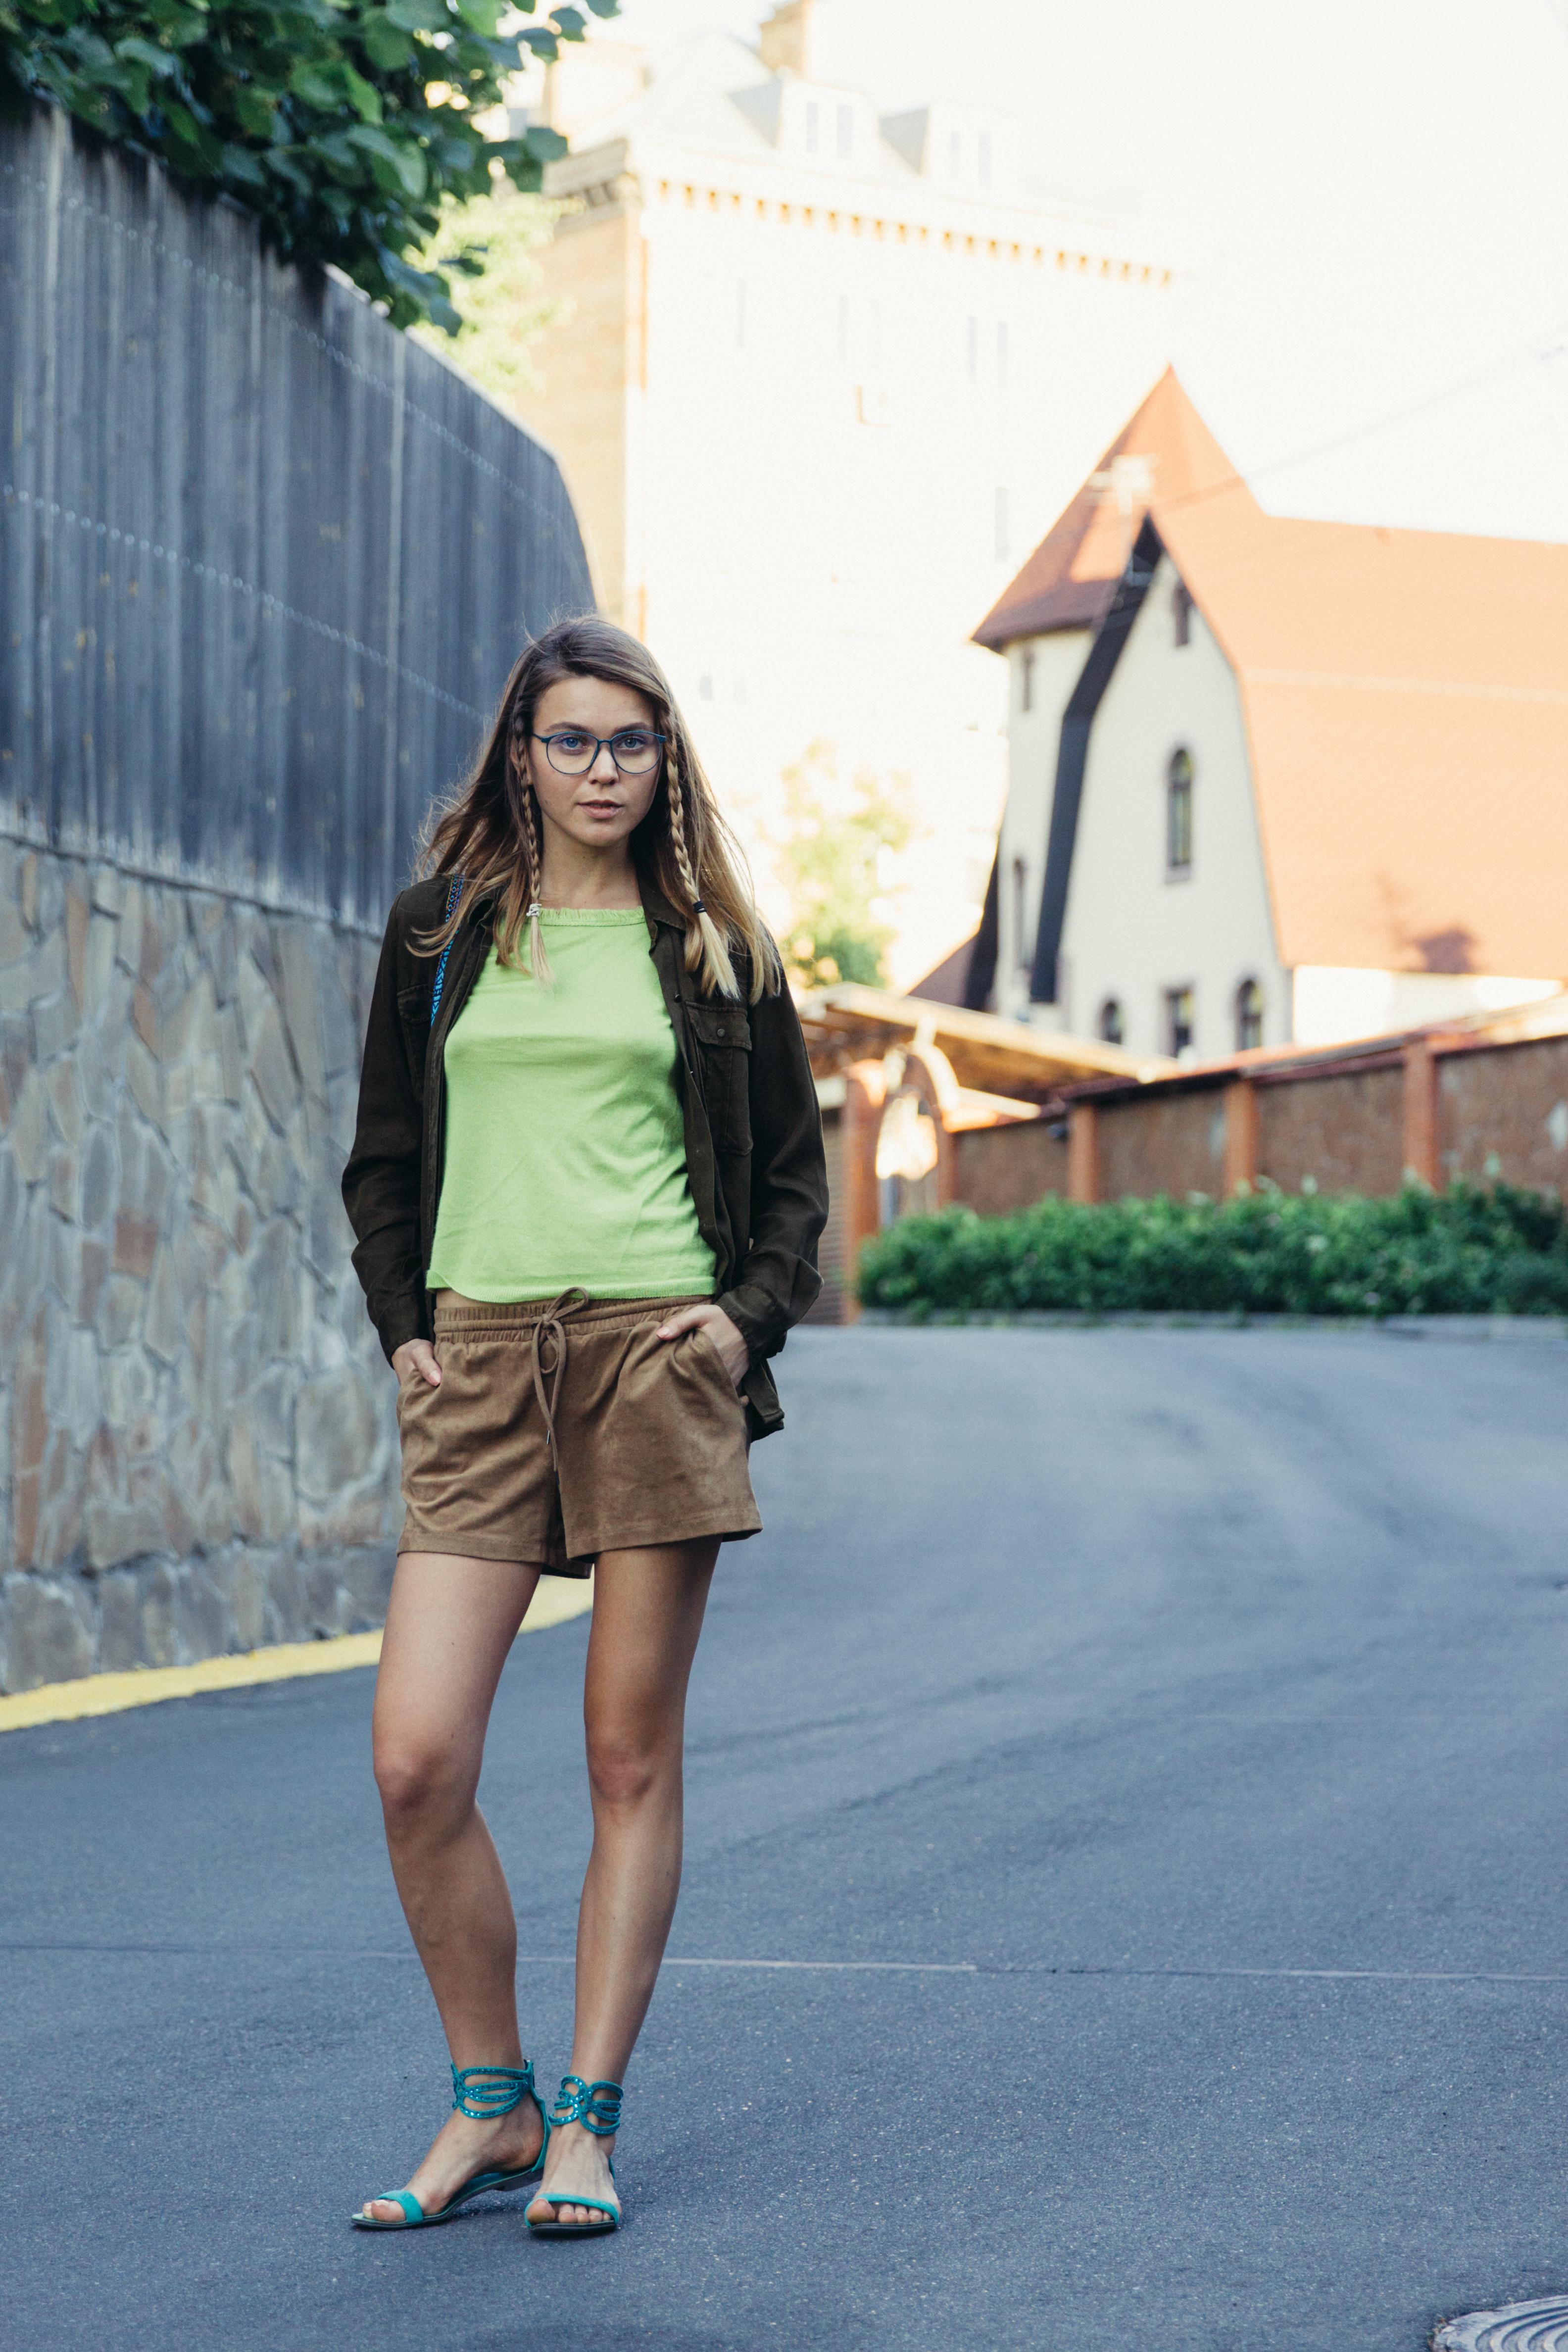 practi cool bohemona breeze with svetlana shashkova